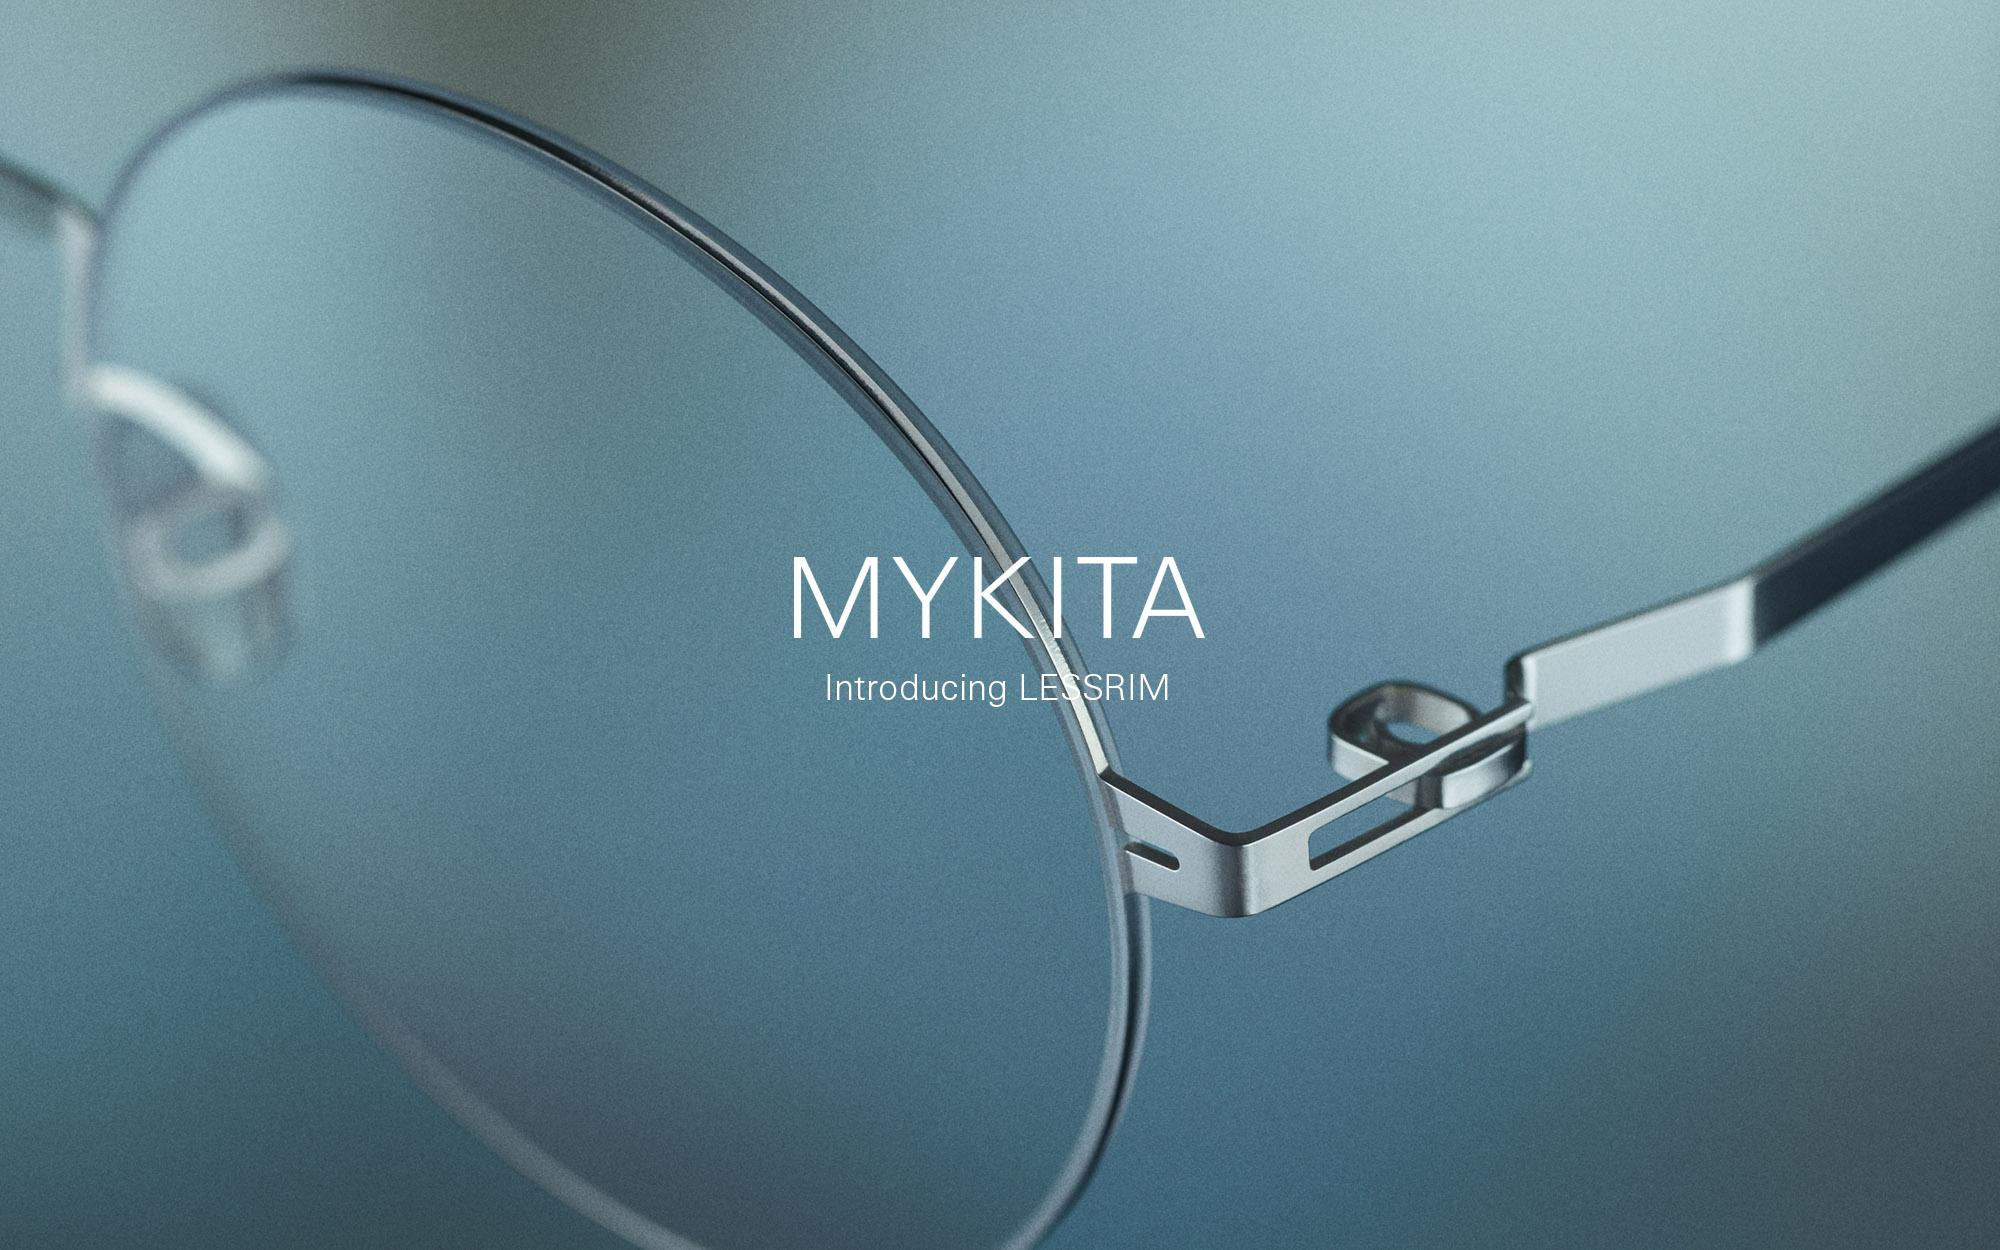 mykita_lessrim